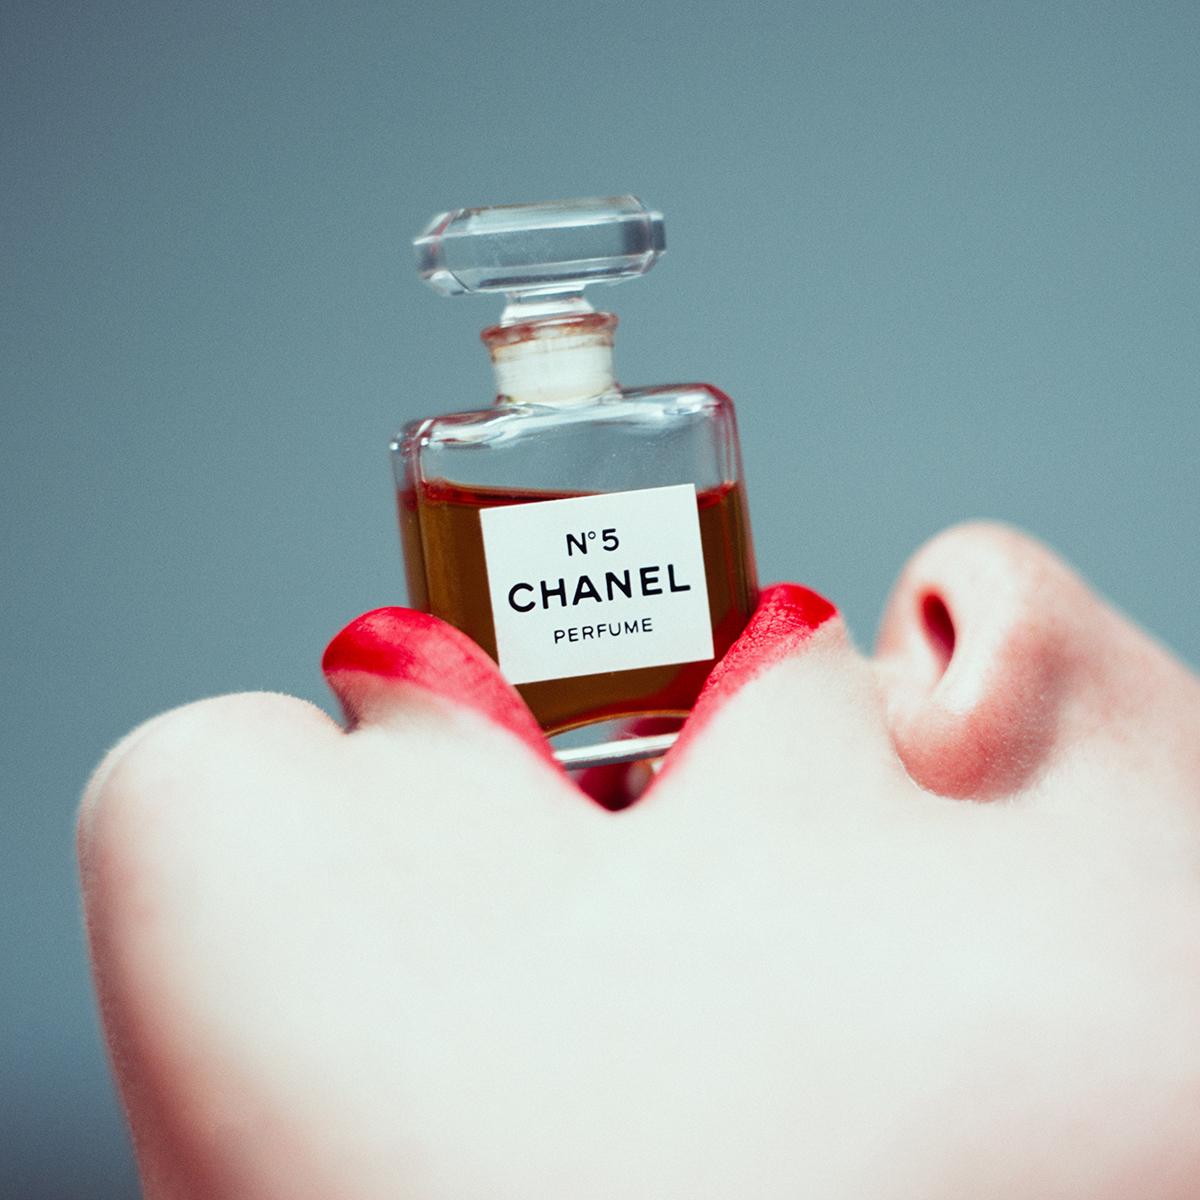 Chanel n°5 per Tyler Shields - Neomag.